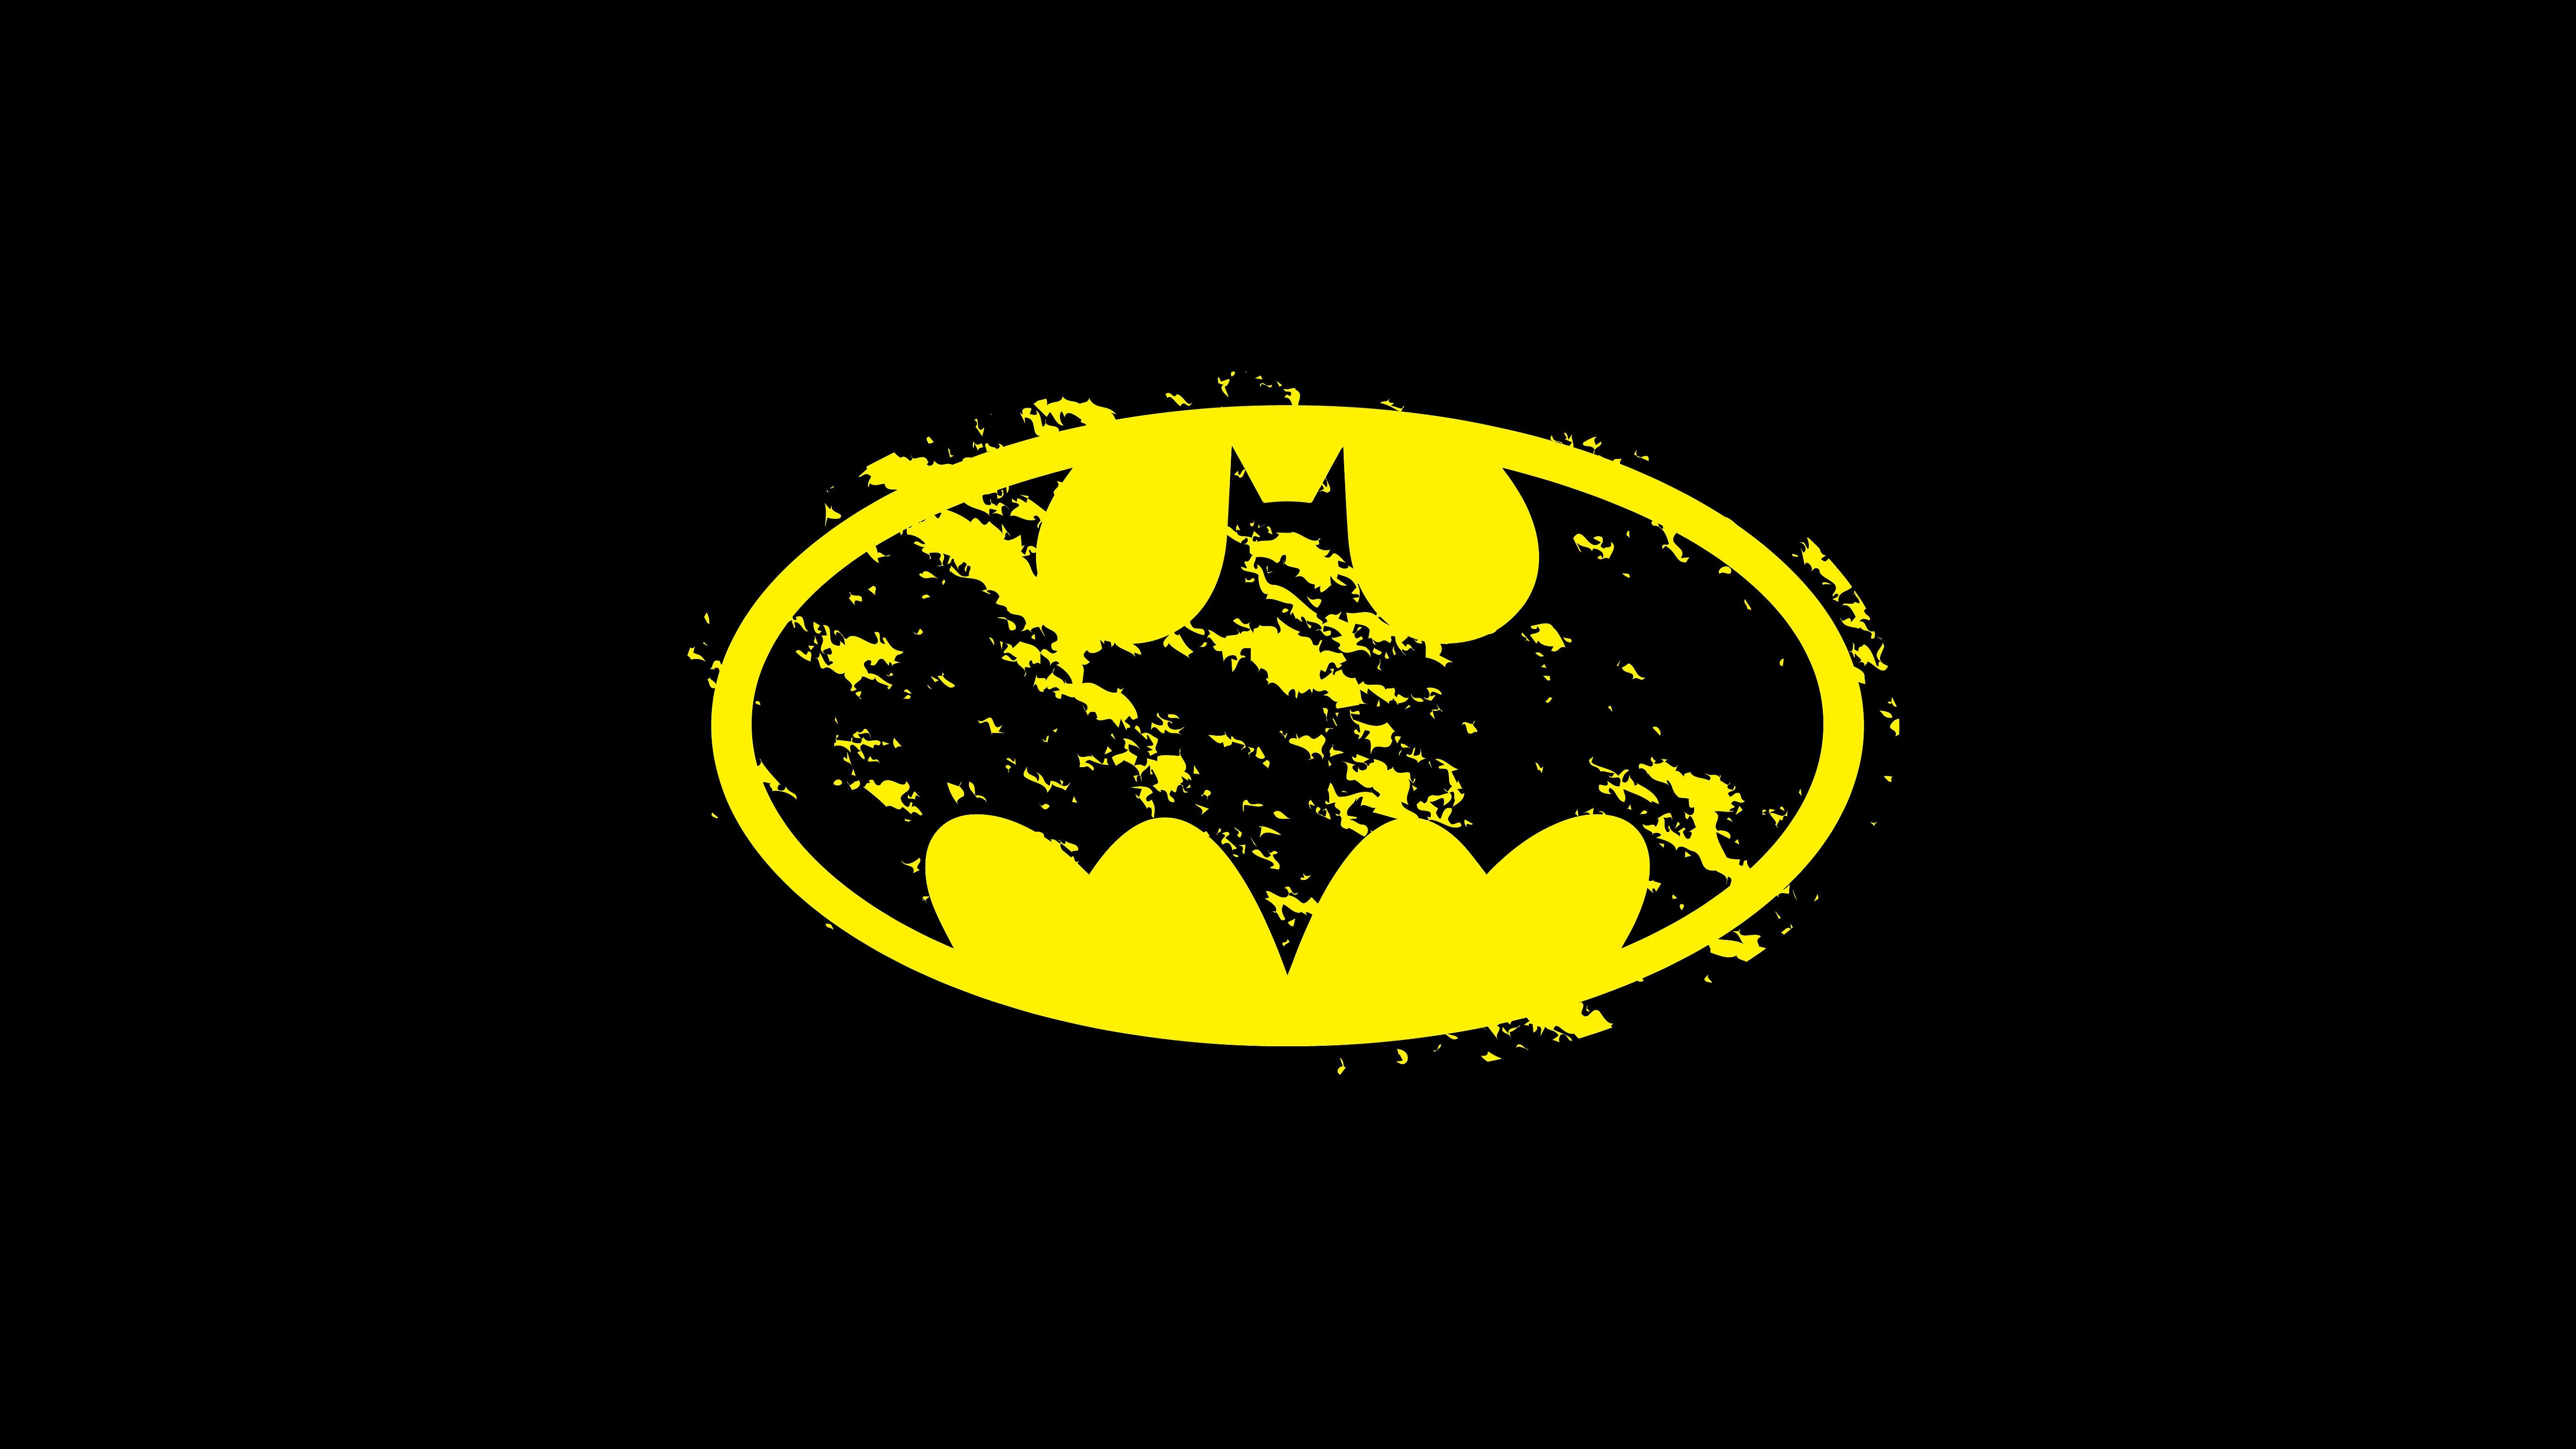 Batman Backgrounds New 2016 download 5500x3094